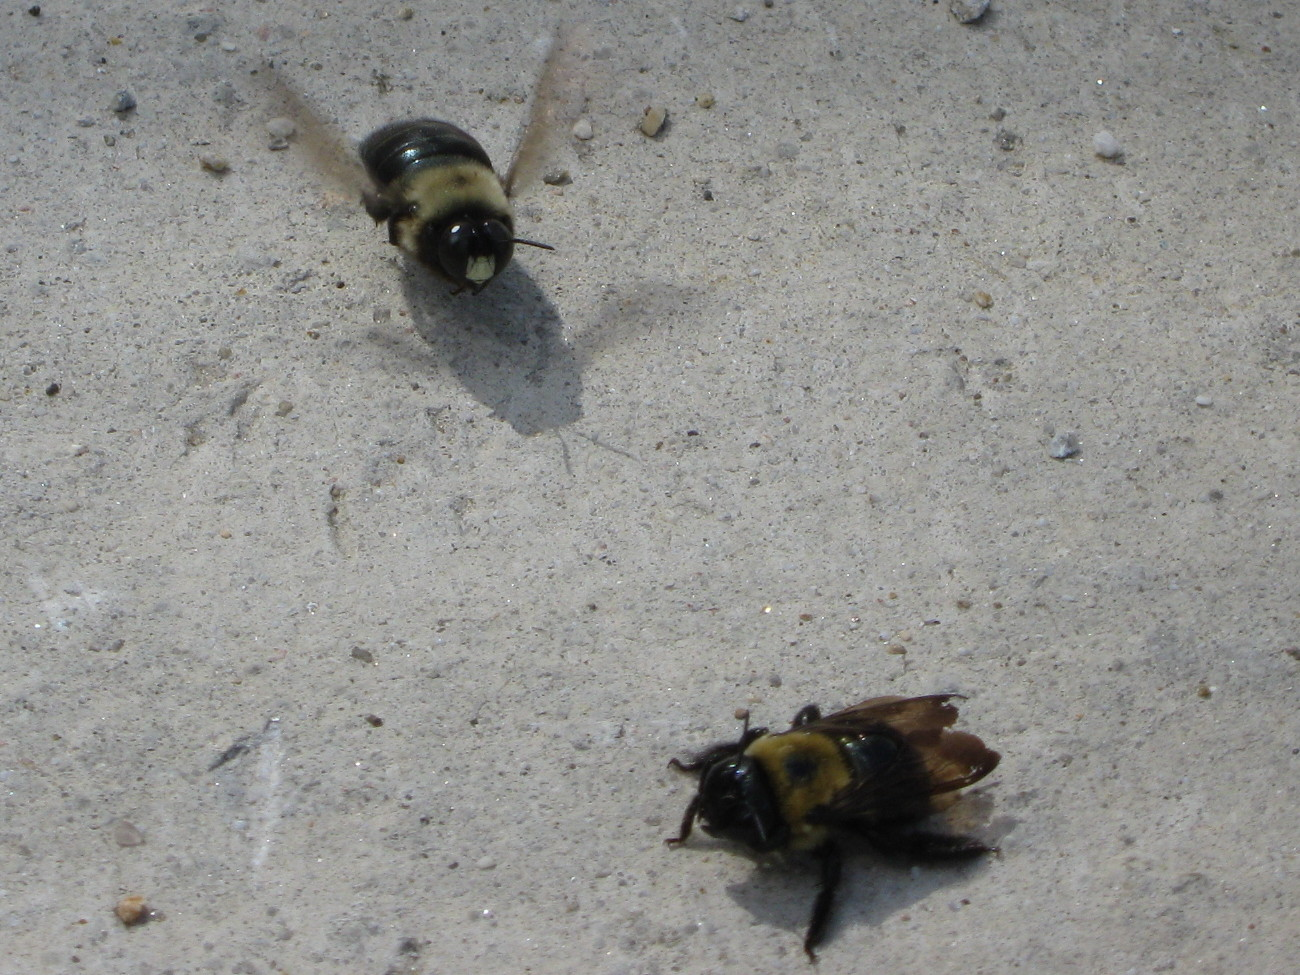 Carpenter bees in luv?